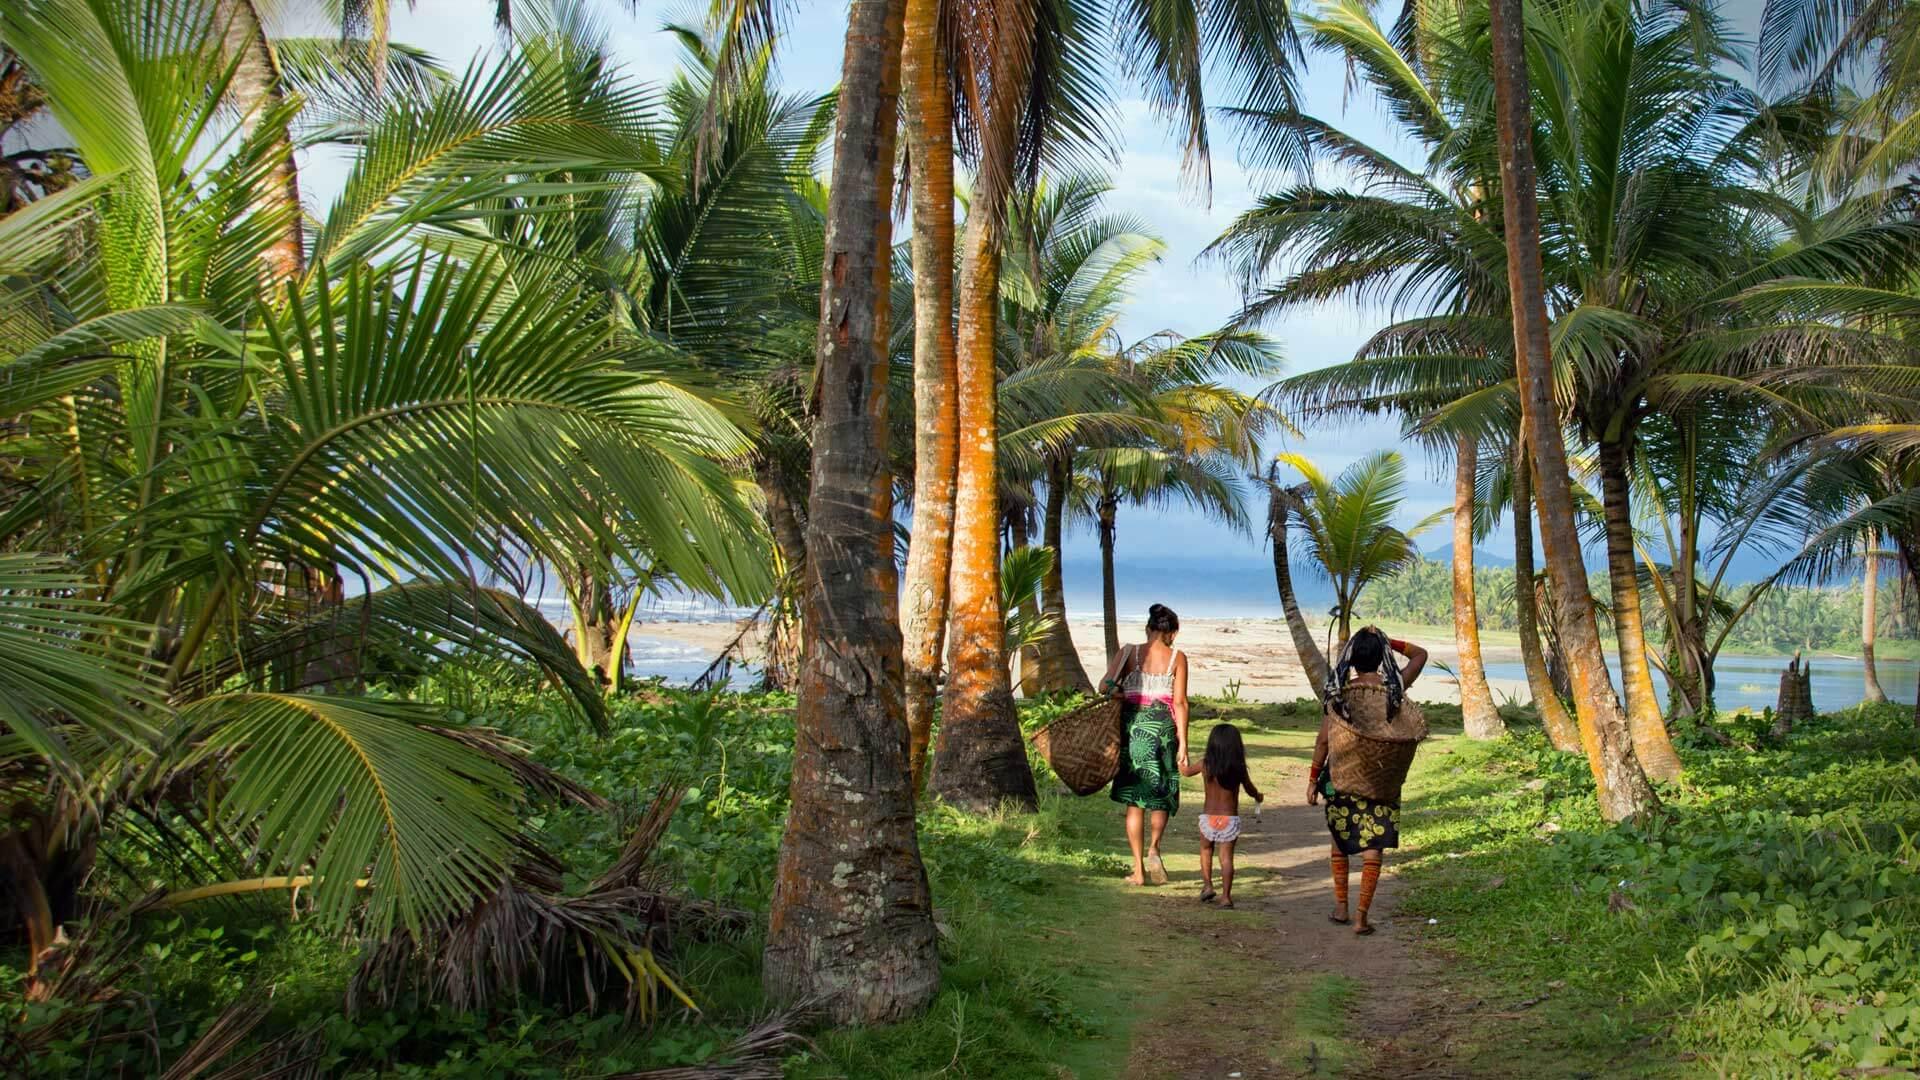 Armila, San Blas - women walking in the shade